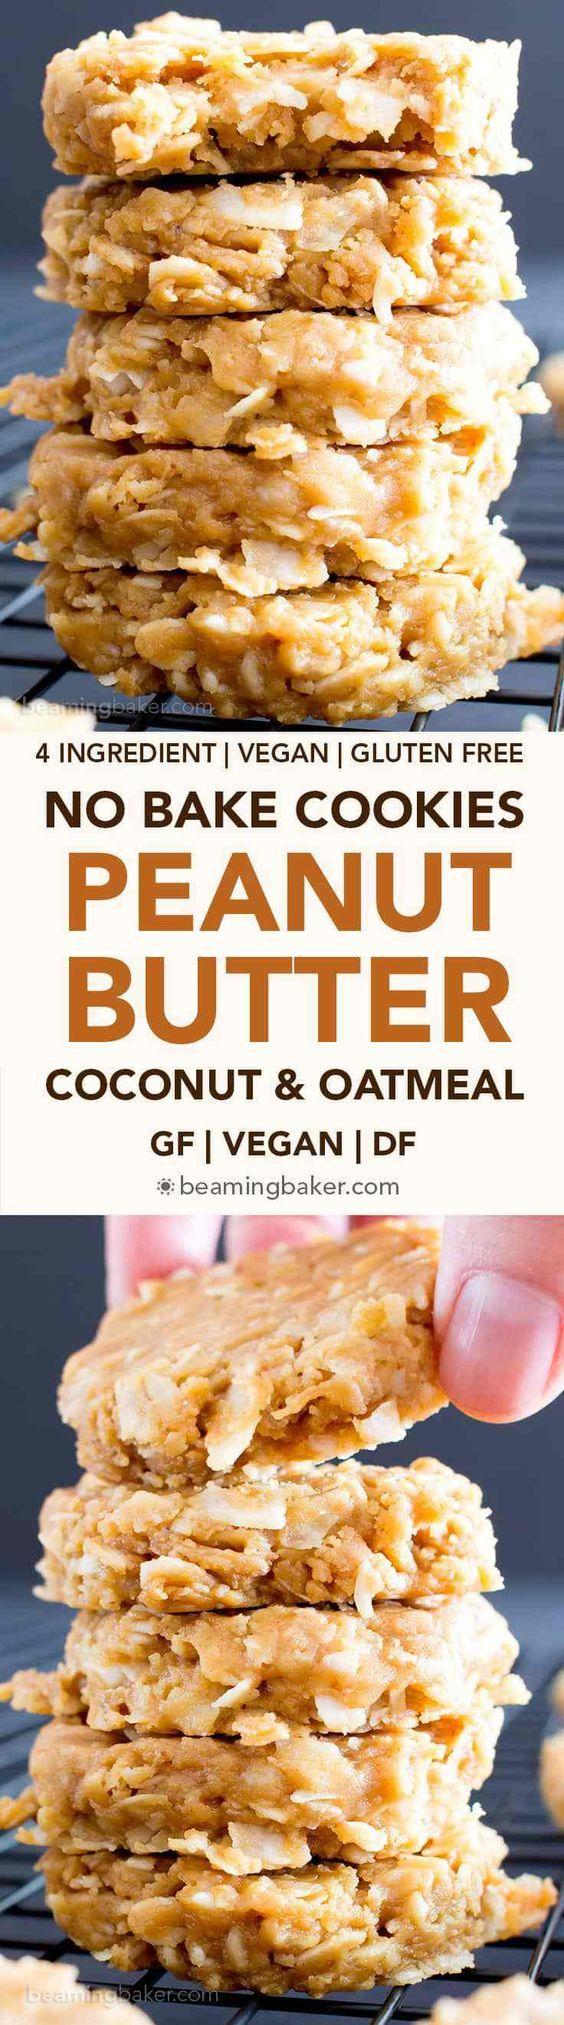 4 Ingredient No Bake Peanut Butter Coconut Oatmeal Cookies (V, GF): a one-bowl recipe for super easy to make peanut butter cookies packed with coconut and oats! #GlutenFree #Vegan #WholeGrain #RefinedSugarFree | BeamingBaker.com